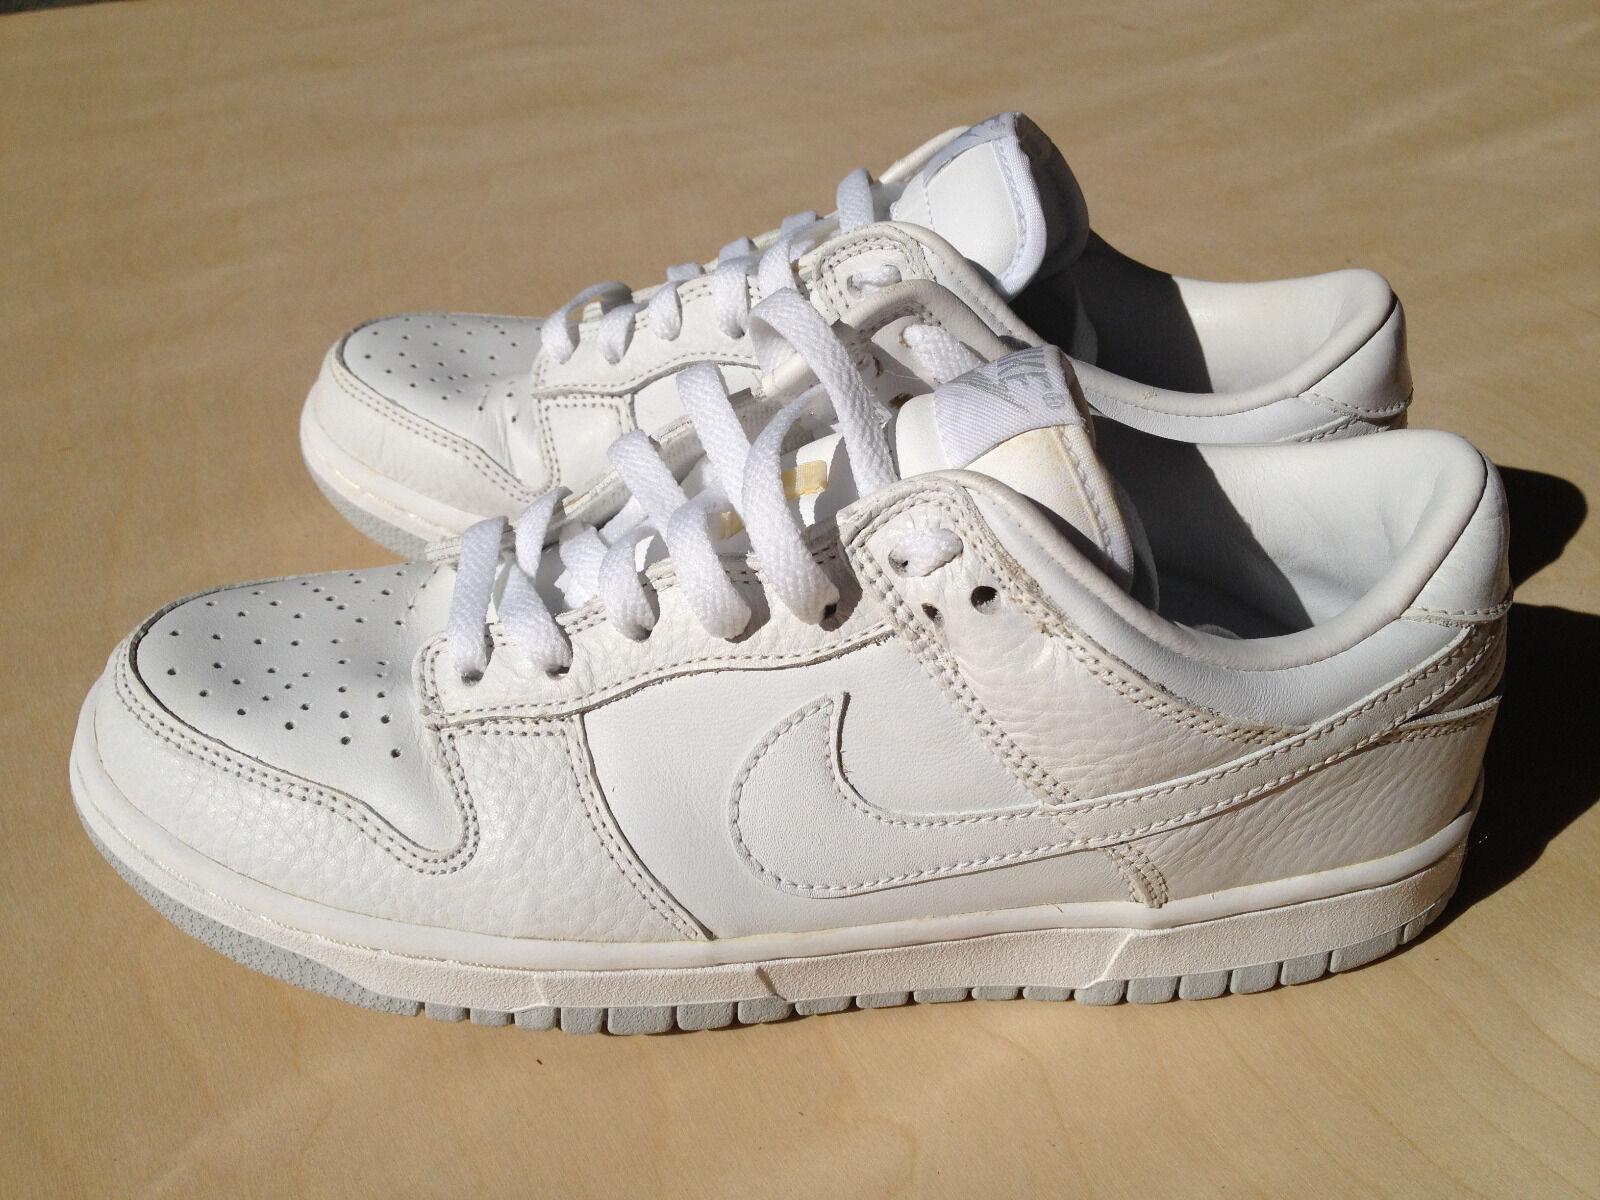 Nike Nike Nike Dunk Low Pro 8 blanco neutral Gris SB vigor aire seminuevo 90 temporada baloncesto recortes de precios, beneficios de descuentos 77a4d5